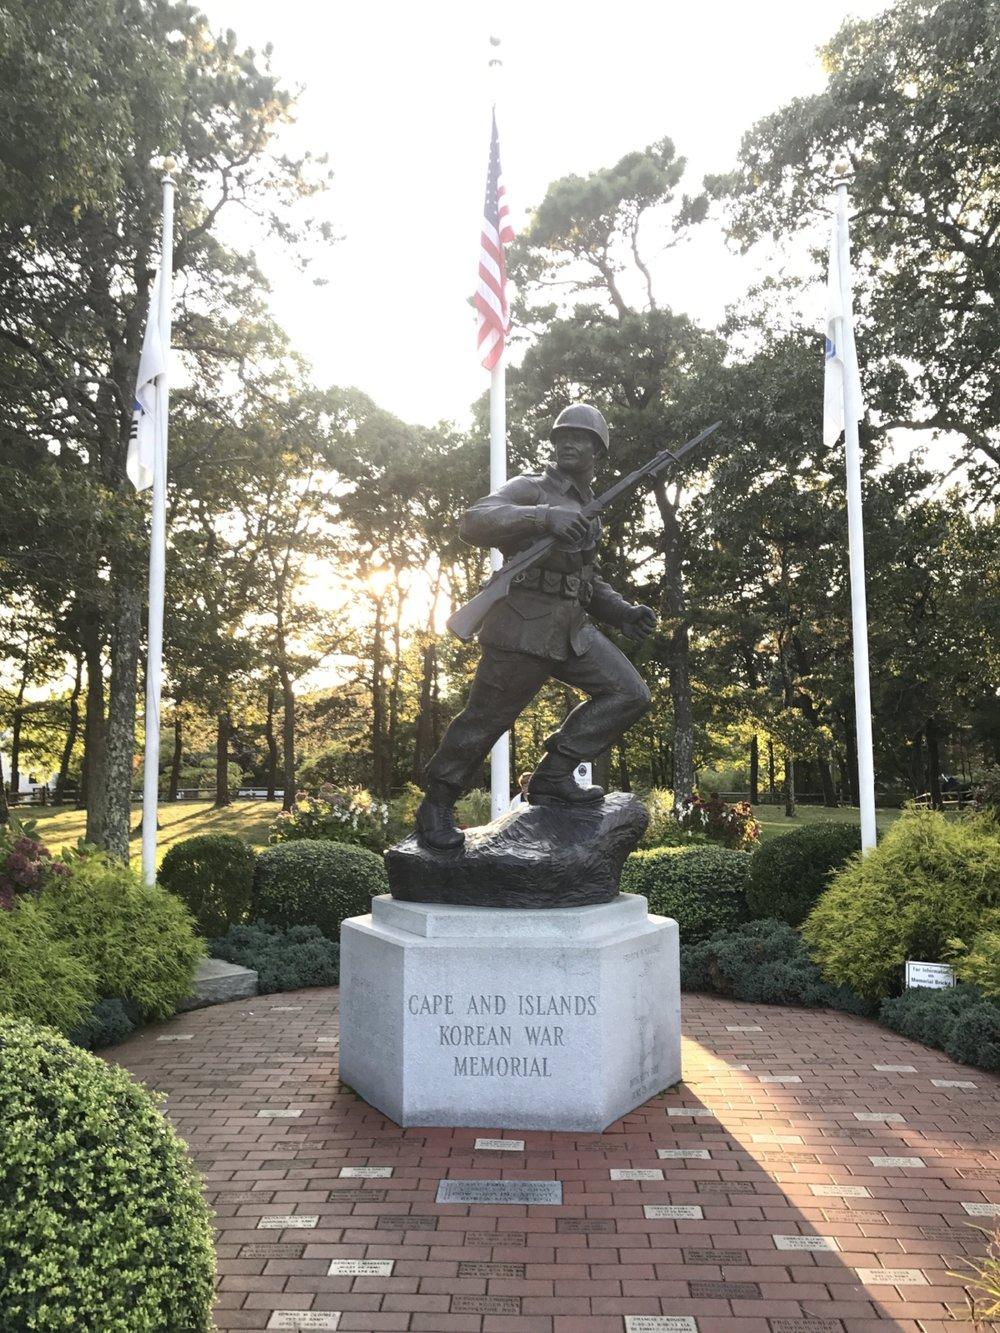 Cape and Islands Korean War Memorial